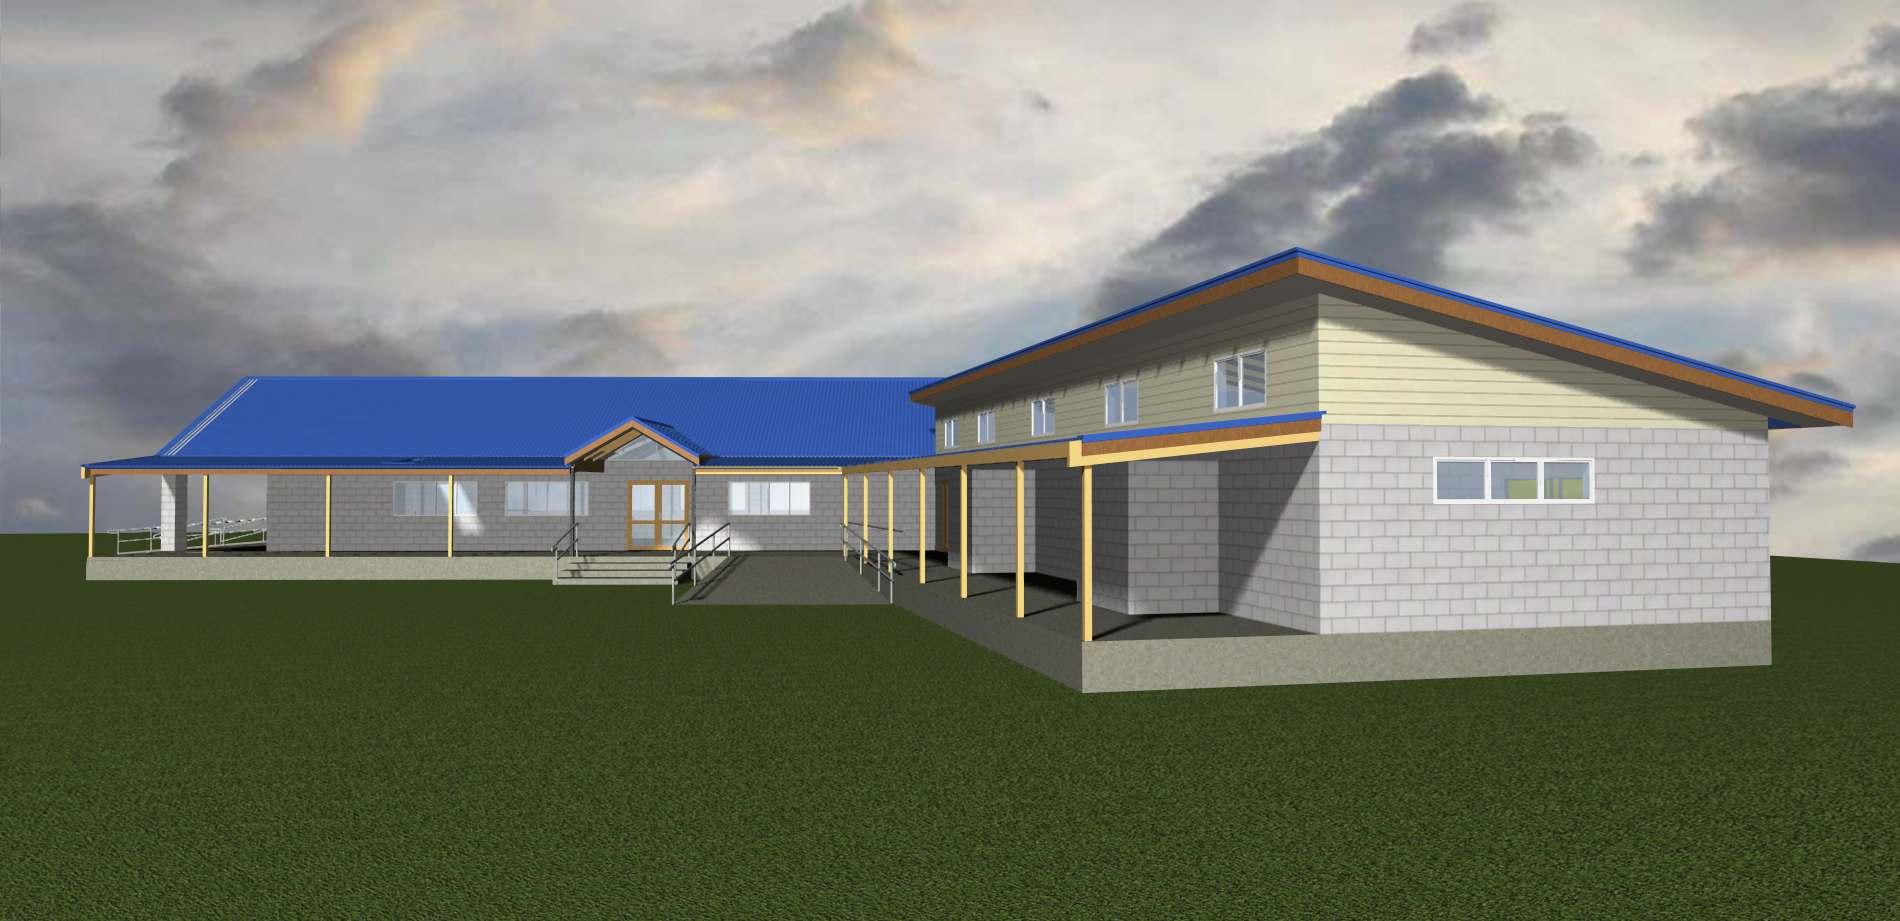 architect ecohomes building designs house plans